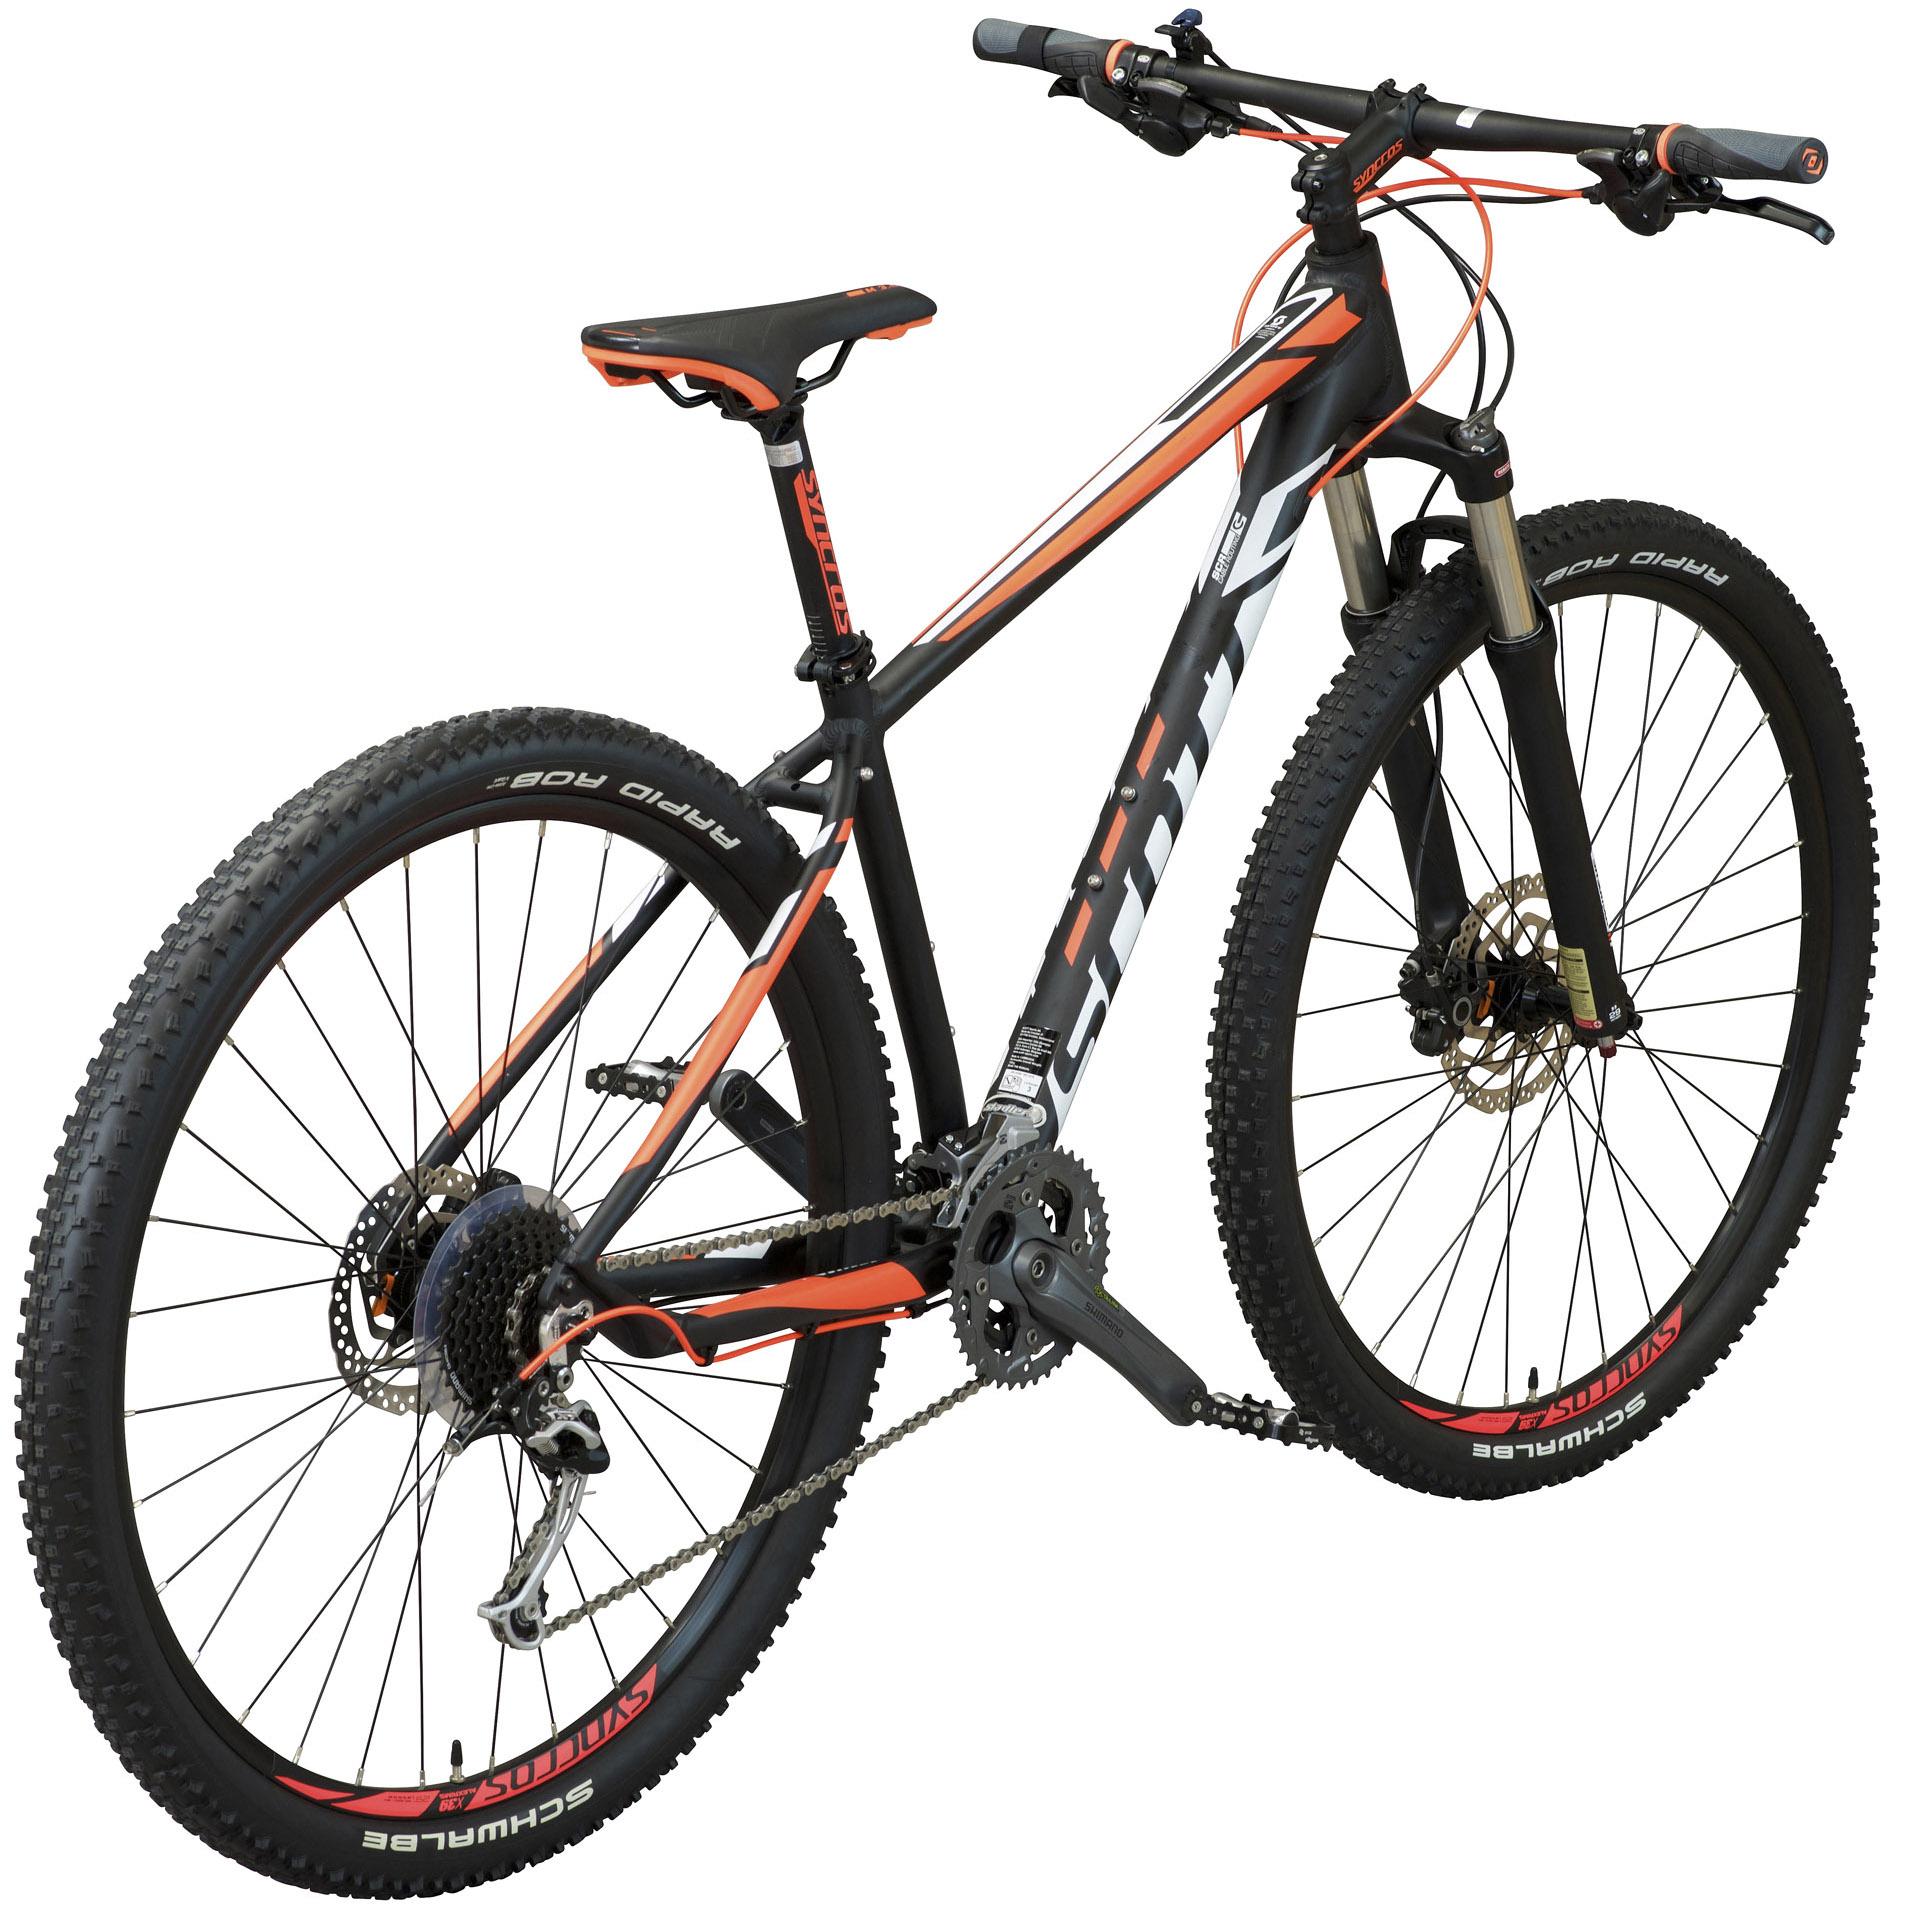 scott peak 900 mountainbike 44 cm online shop zweirad. Black Bedroom Furniture Sets. Home Design Ideas